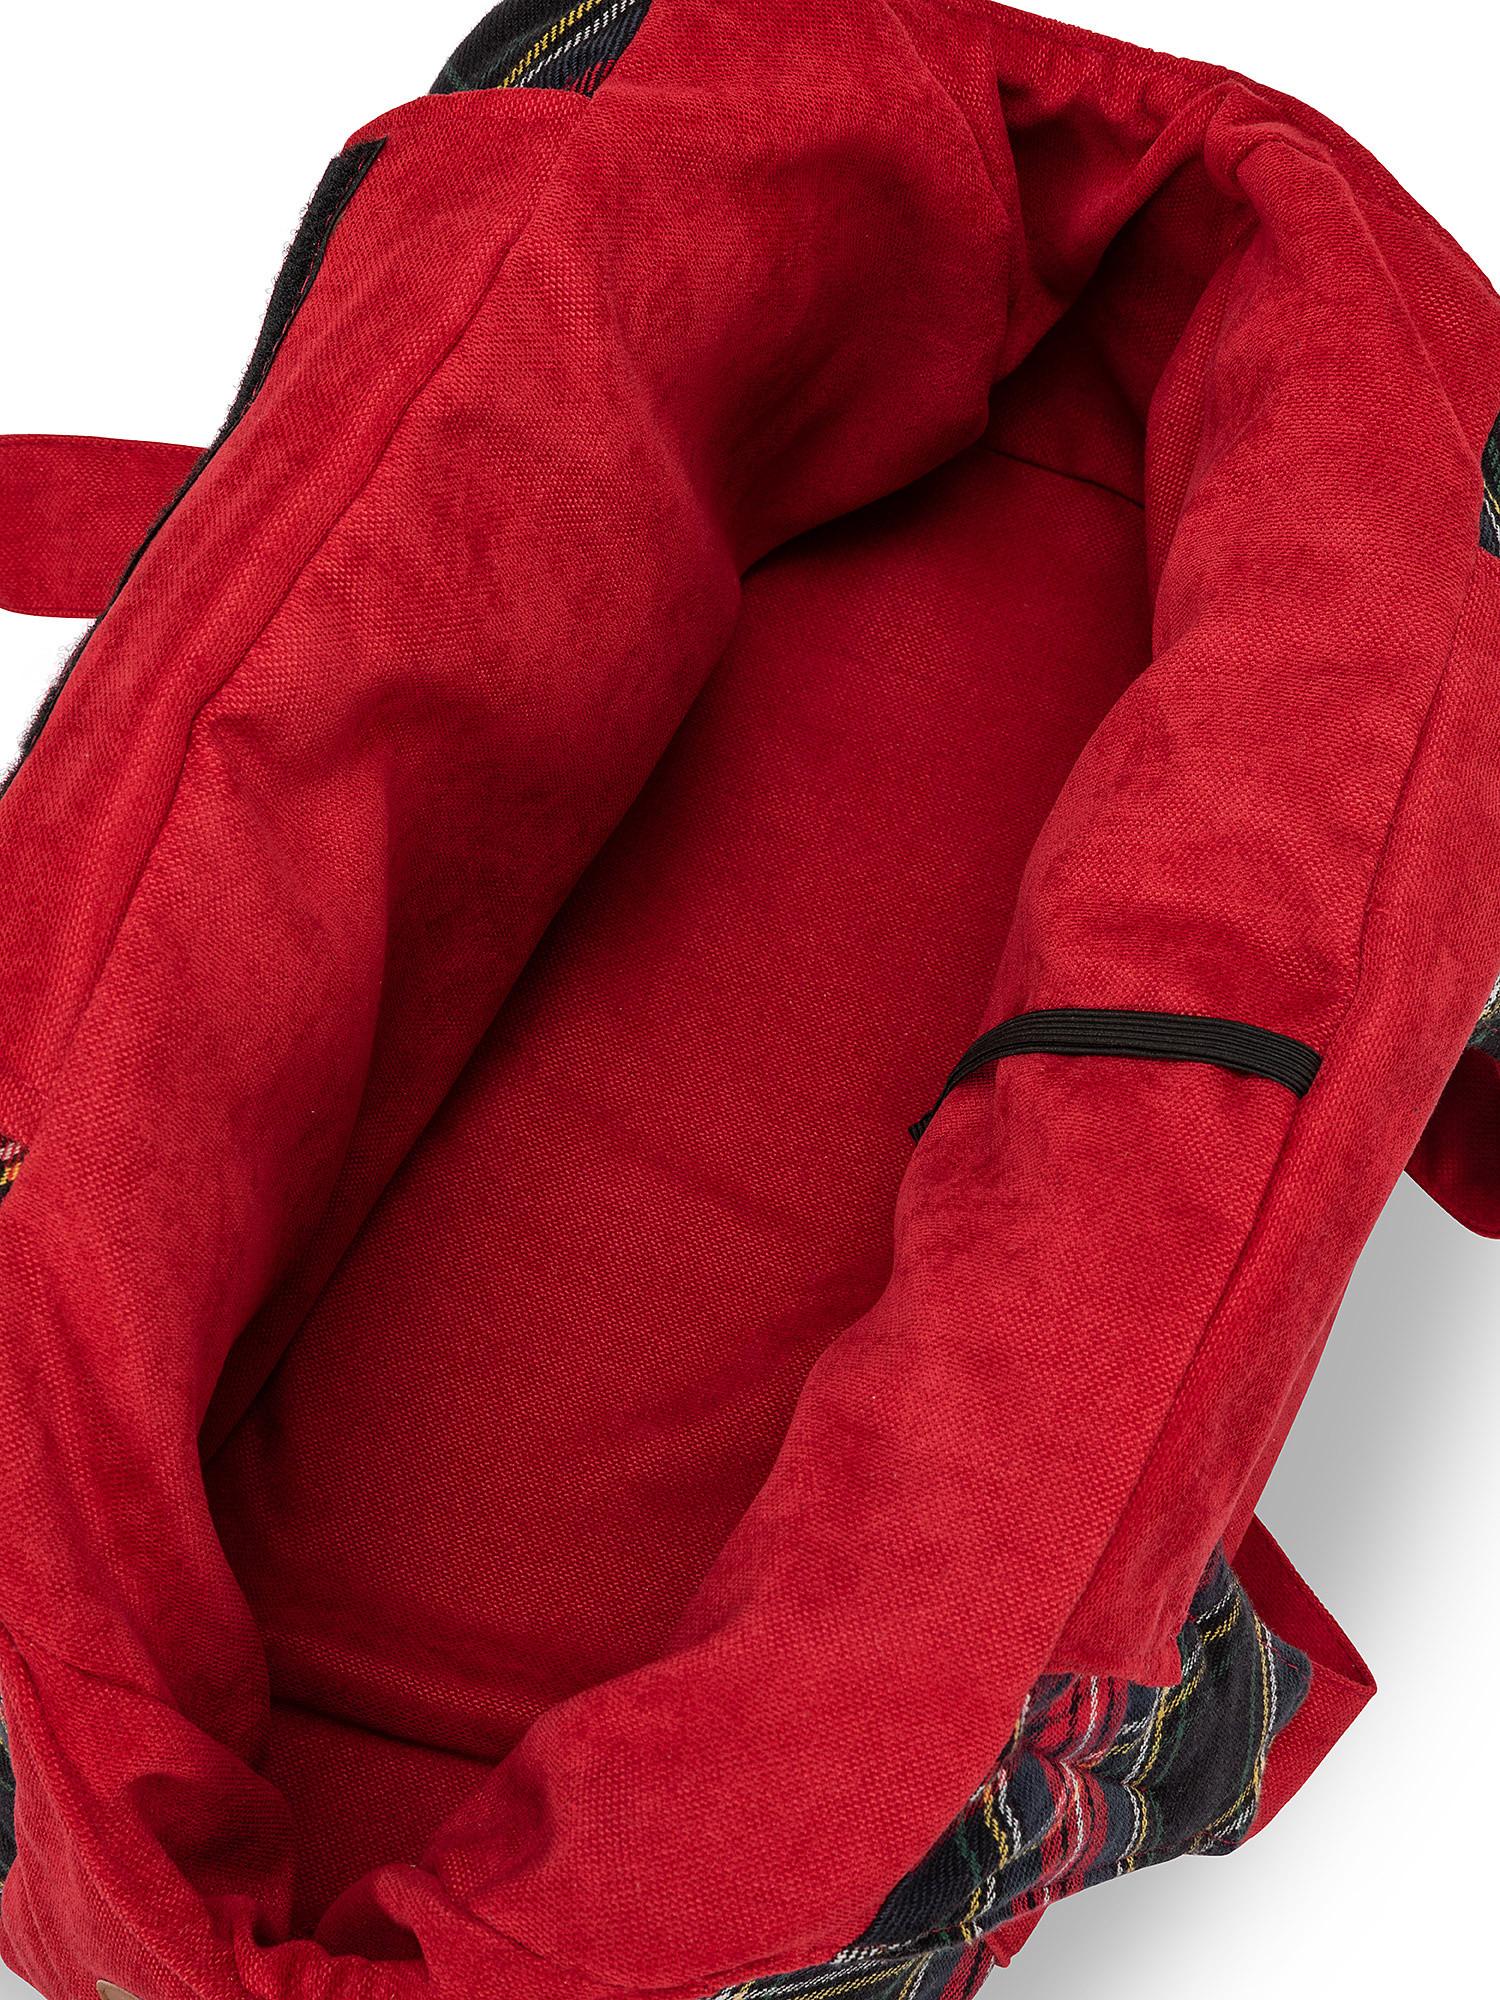 Borsa trasportino motivo tartan, Rosso, large image number 1